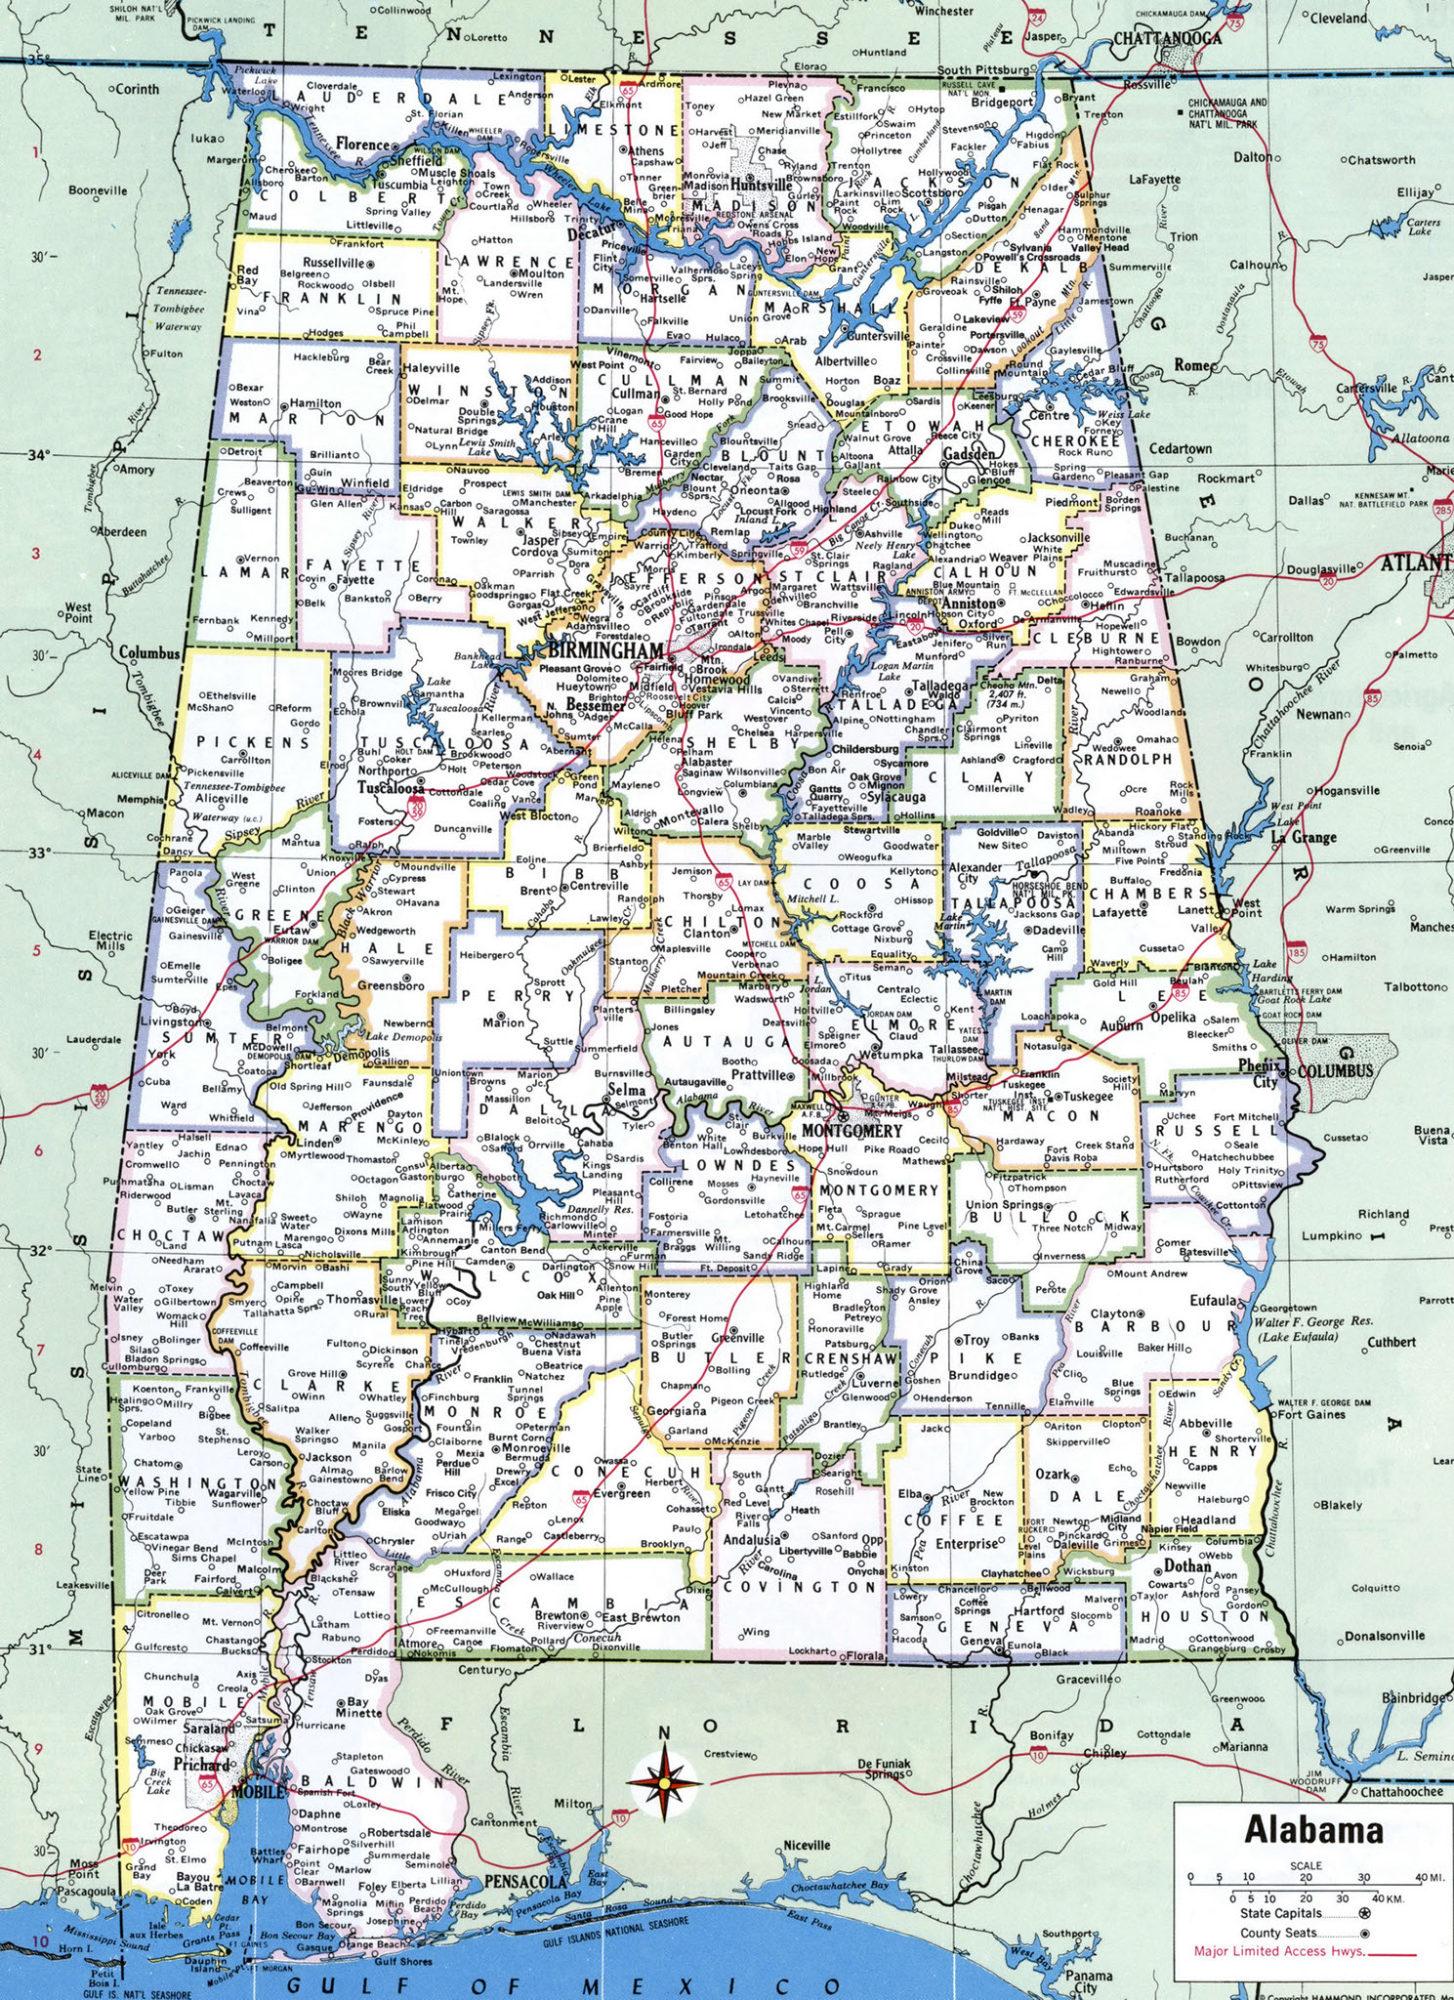 Alabama Large Political  Map   Political  Map of Alabama With Capital , city and River lake-7